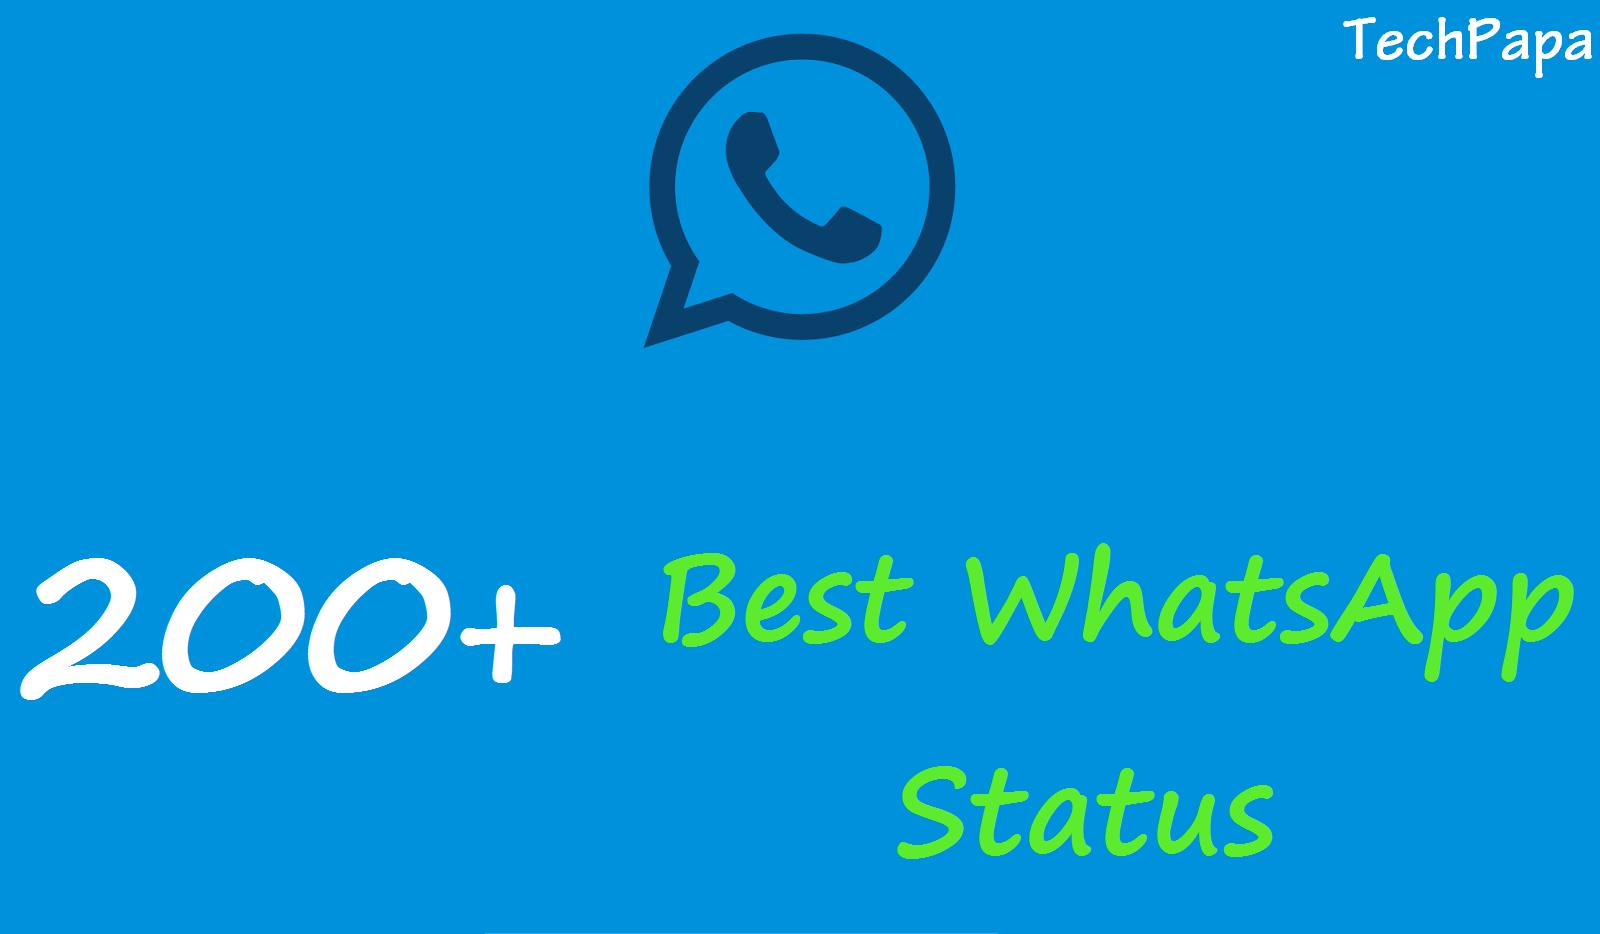 Locubs 200 Best Whatsapp Status